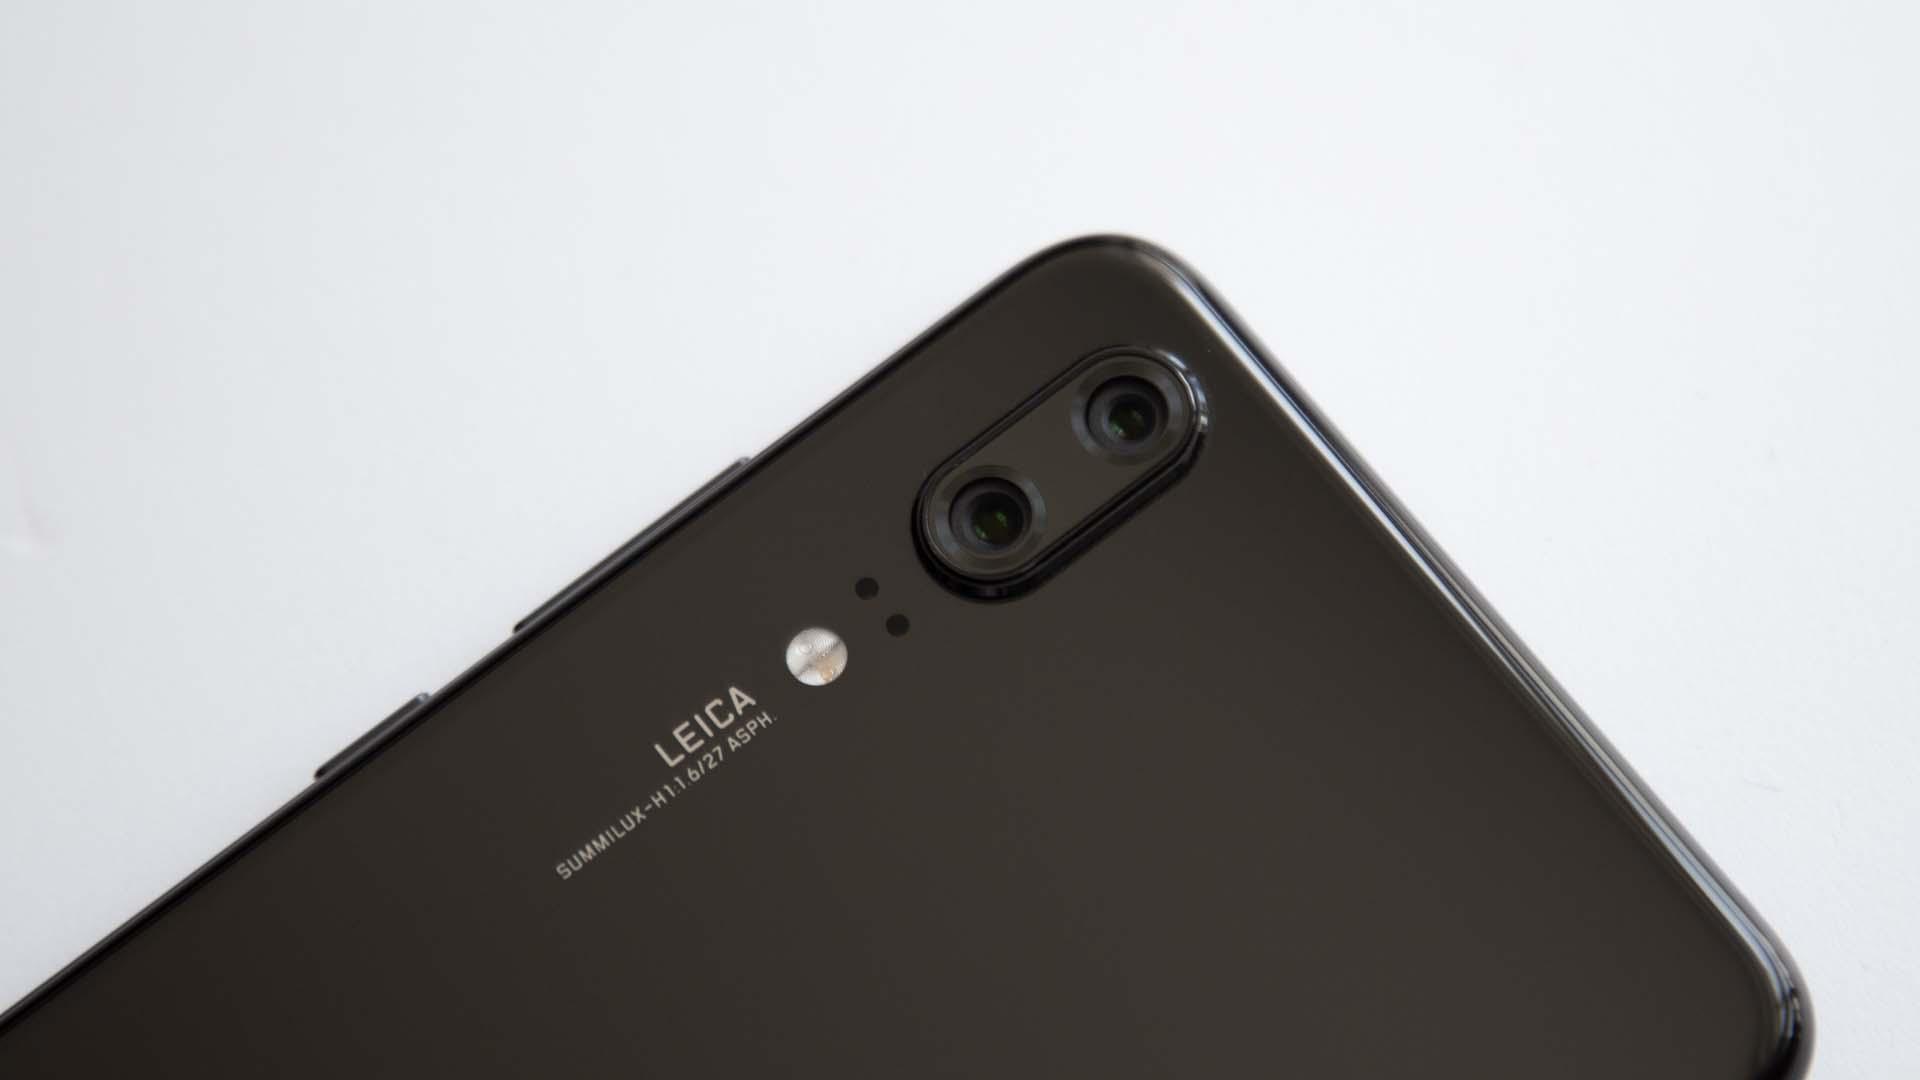 Fotocamera Leica Huawei P20